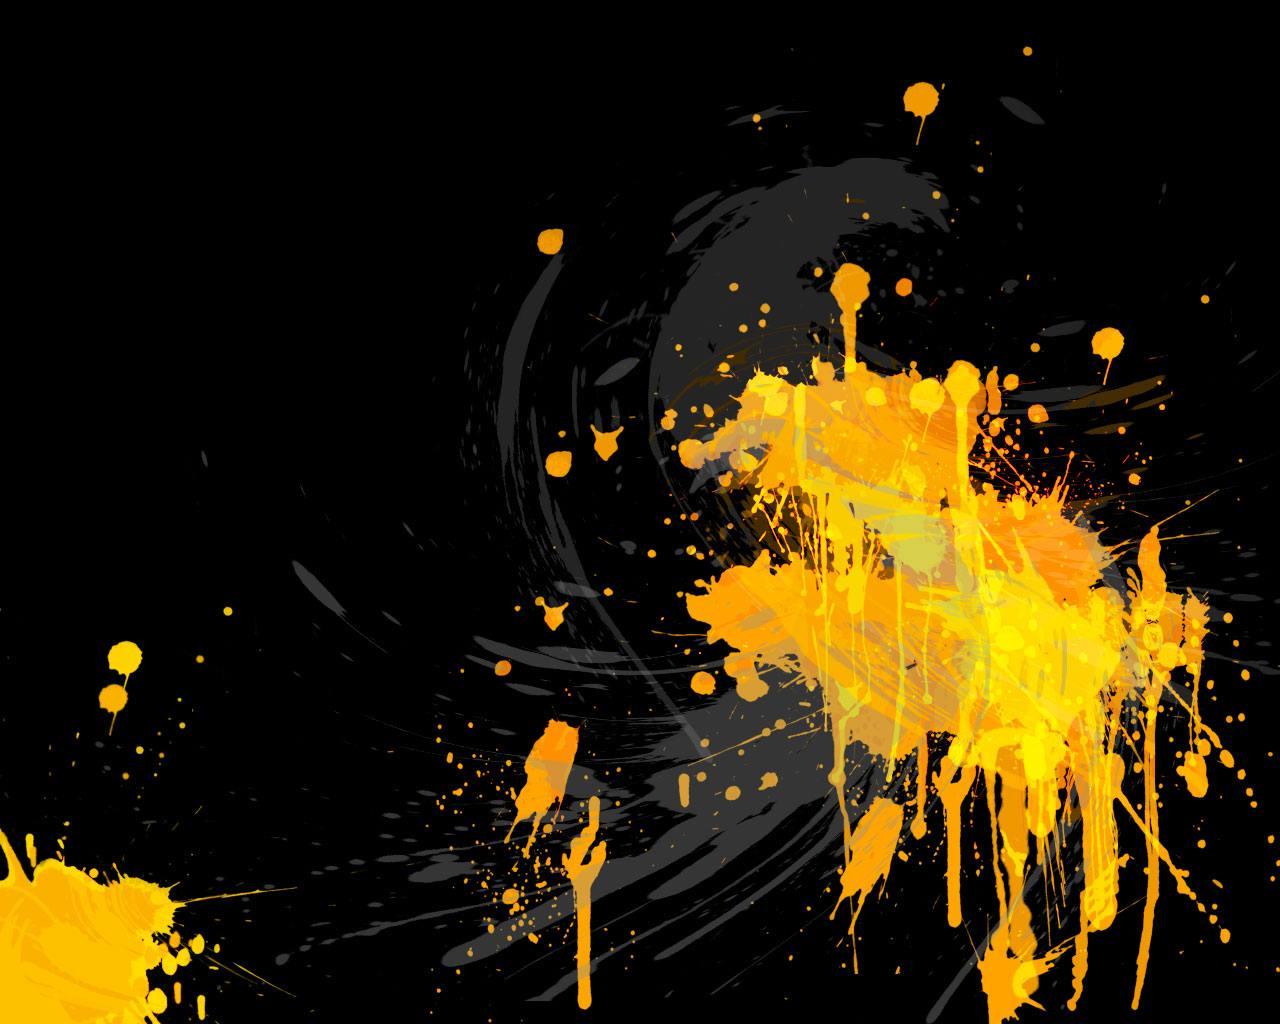 Free Splatter Wallpaper 1280x1024 10519